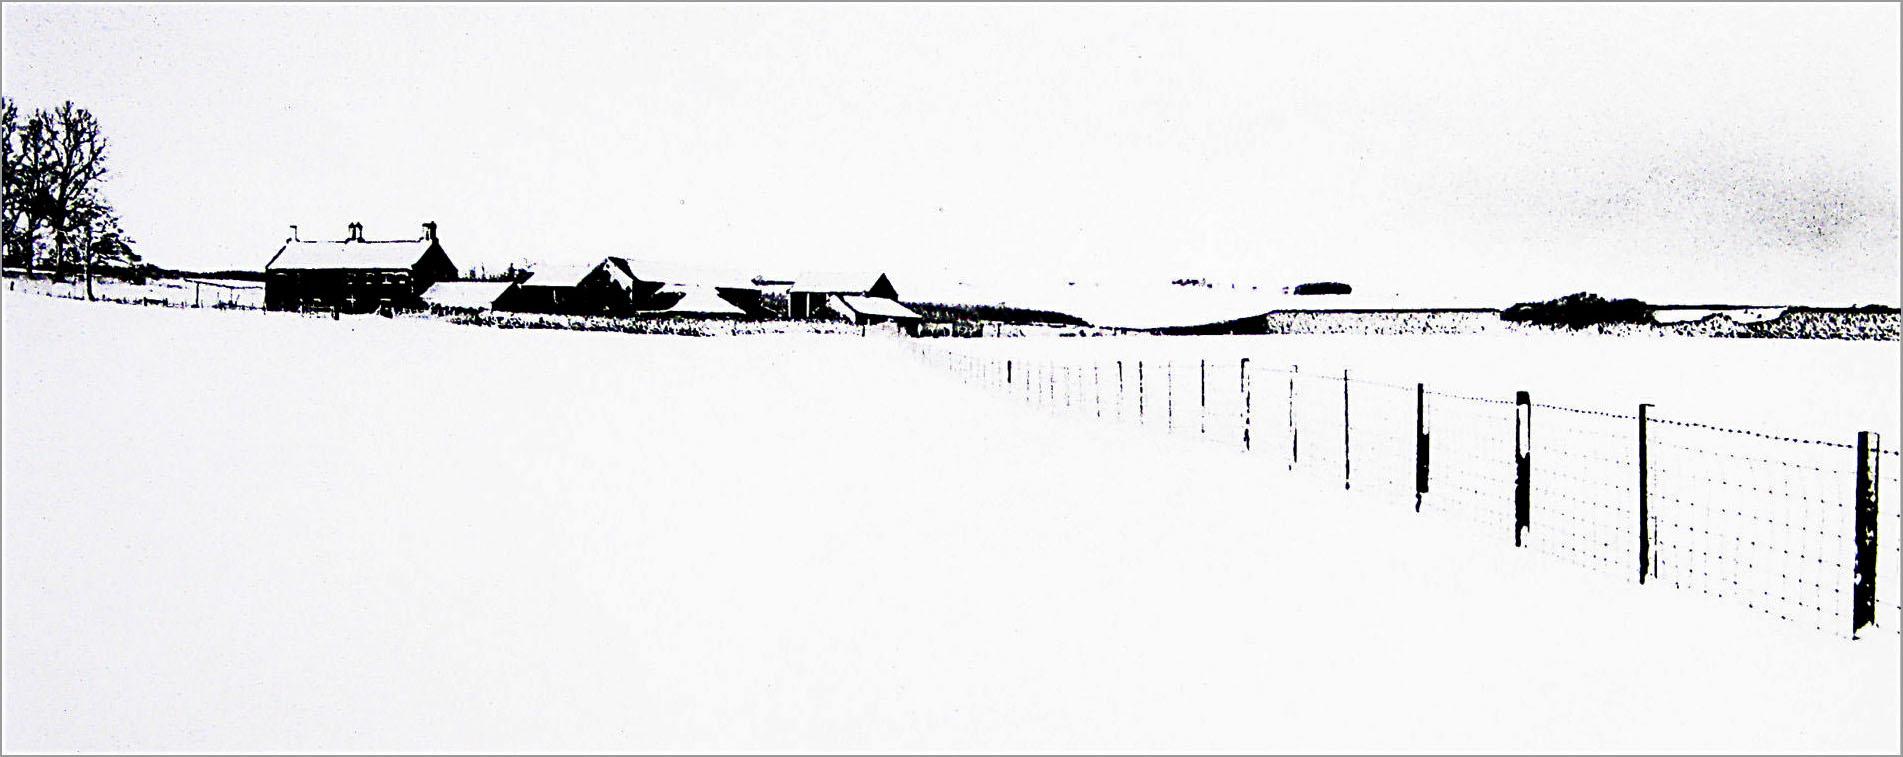 Farm under Heavy Snowfall